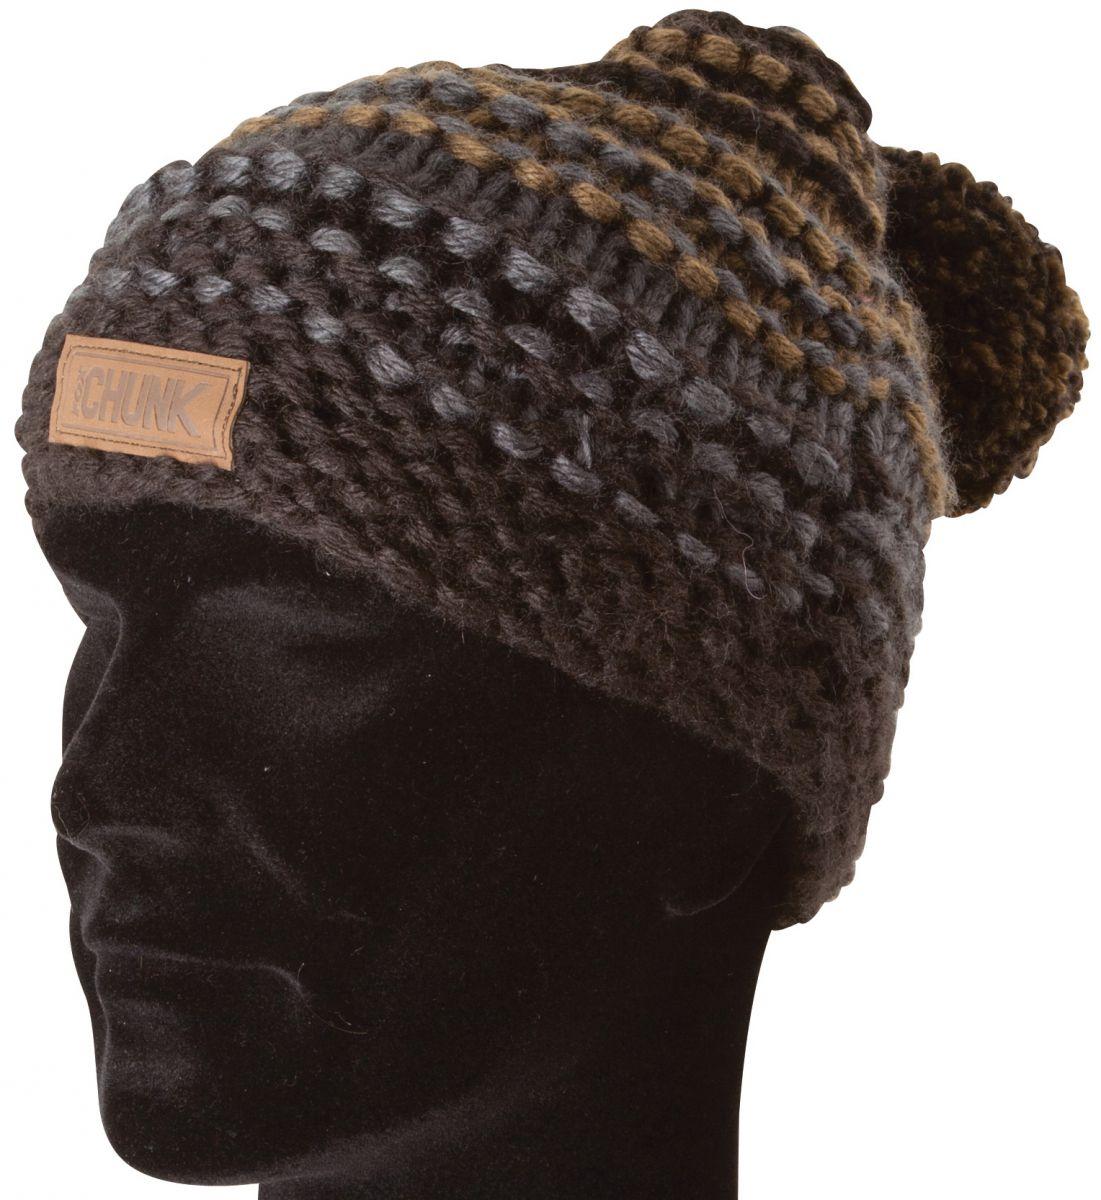 10faad5c4 Fox Čiapka CHUNK™ Bobble Hat - čiapky, šiltovky - AkoNaRyby